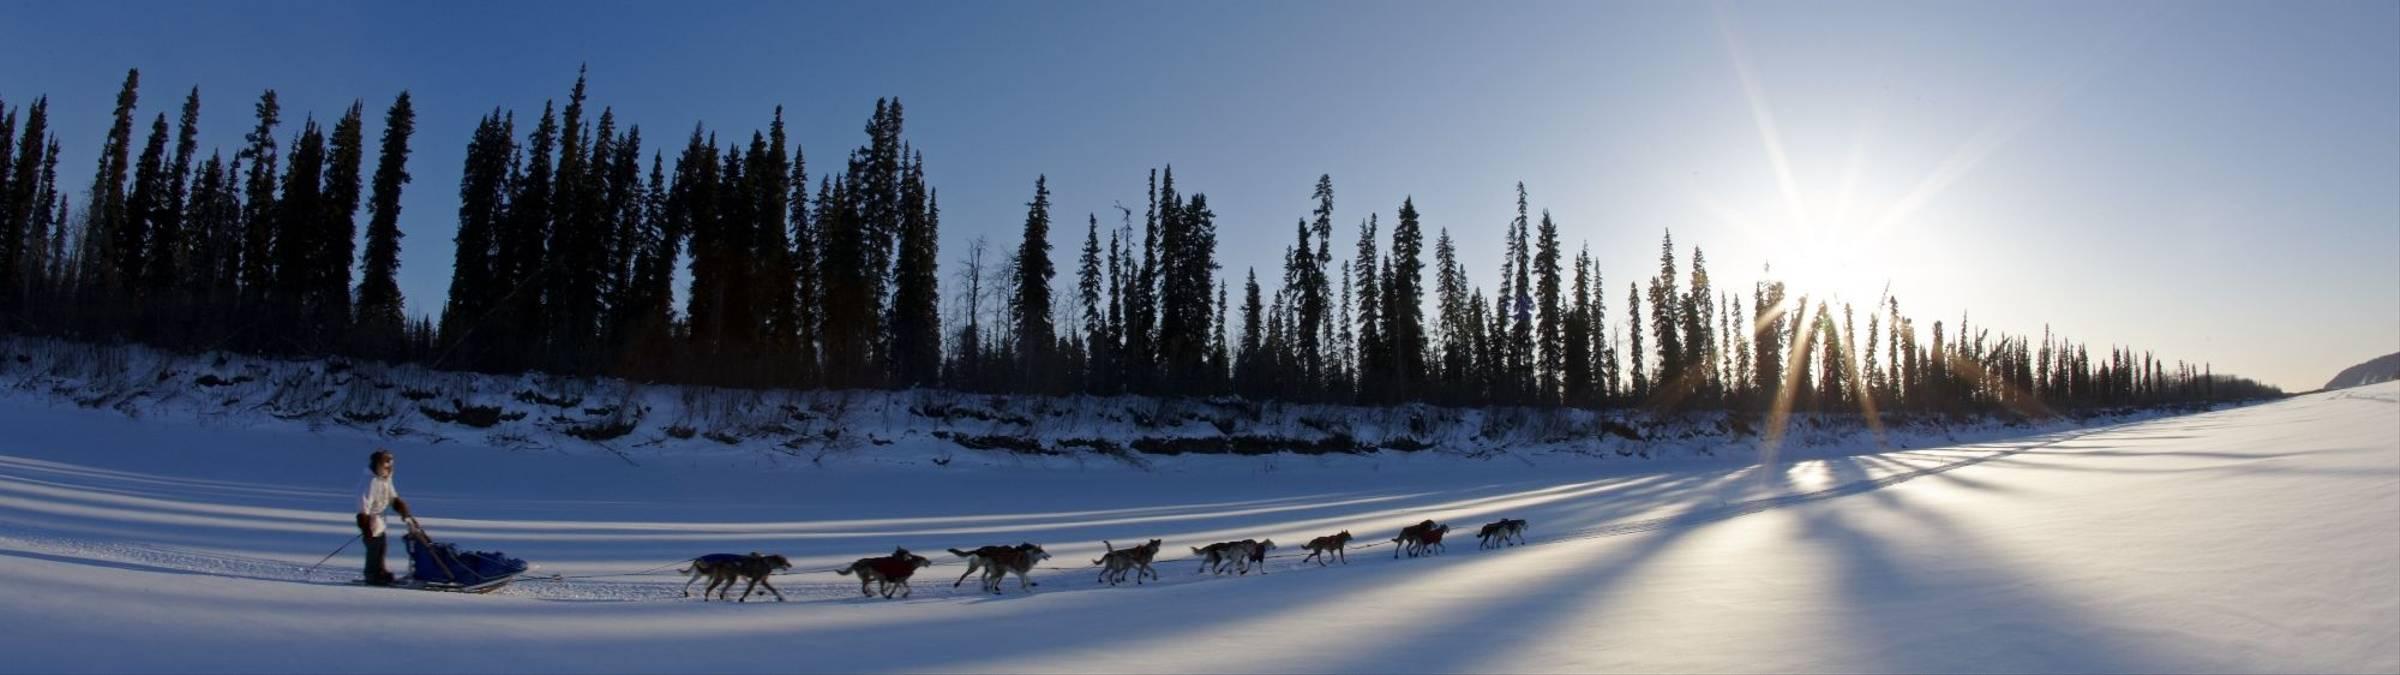 Iditarod Yukon River Credits State of Alaska Chris McLennan.jpg